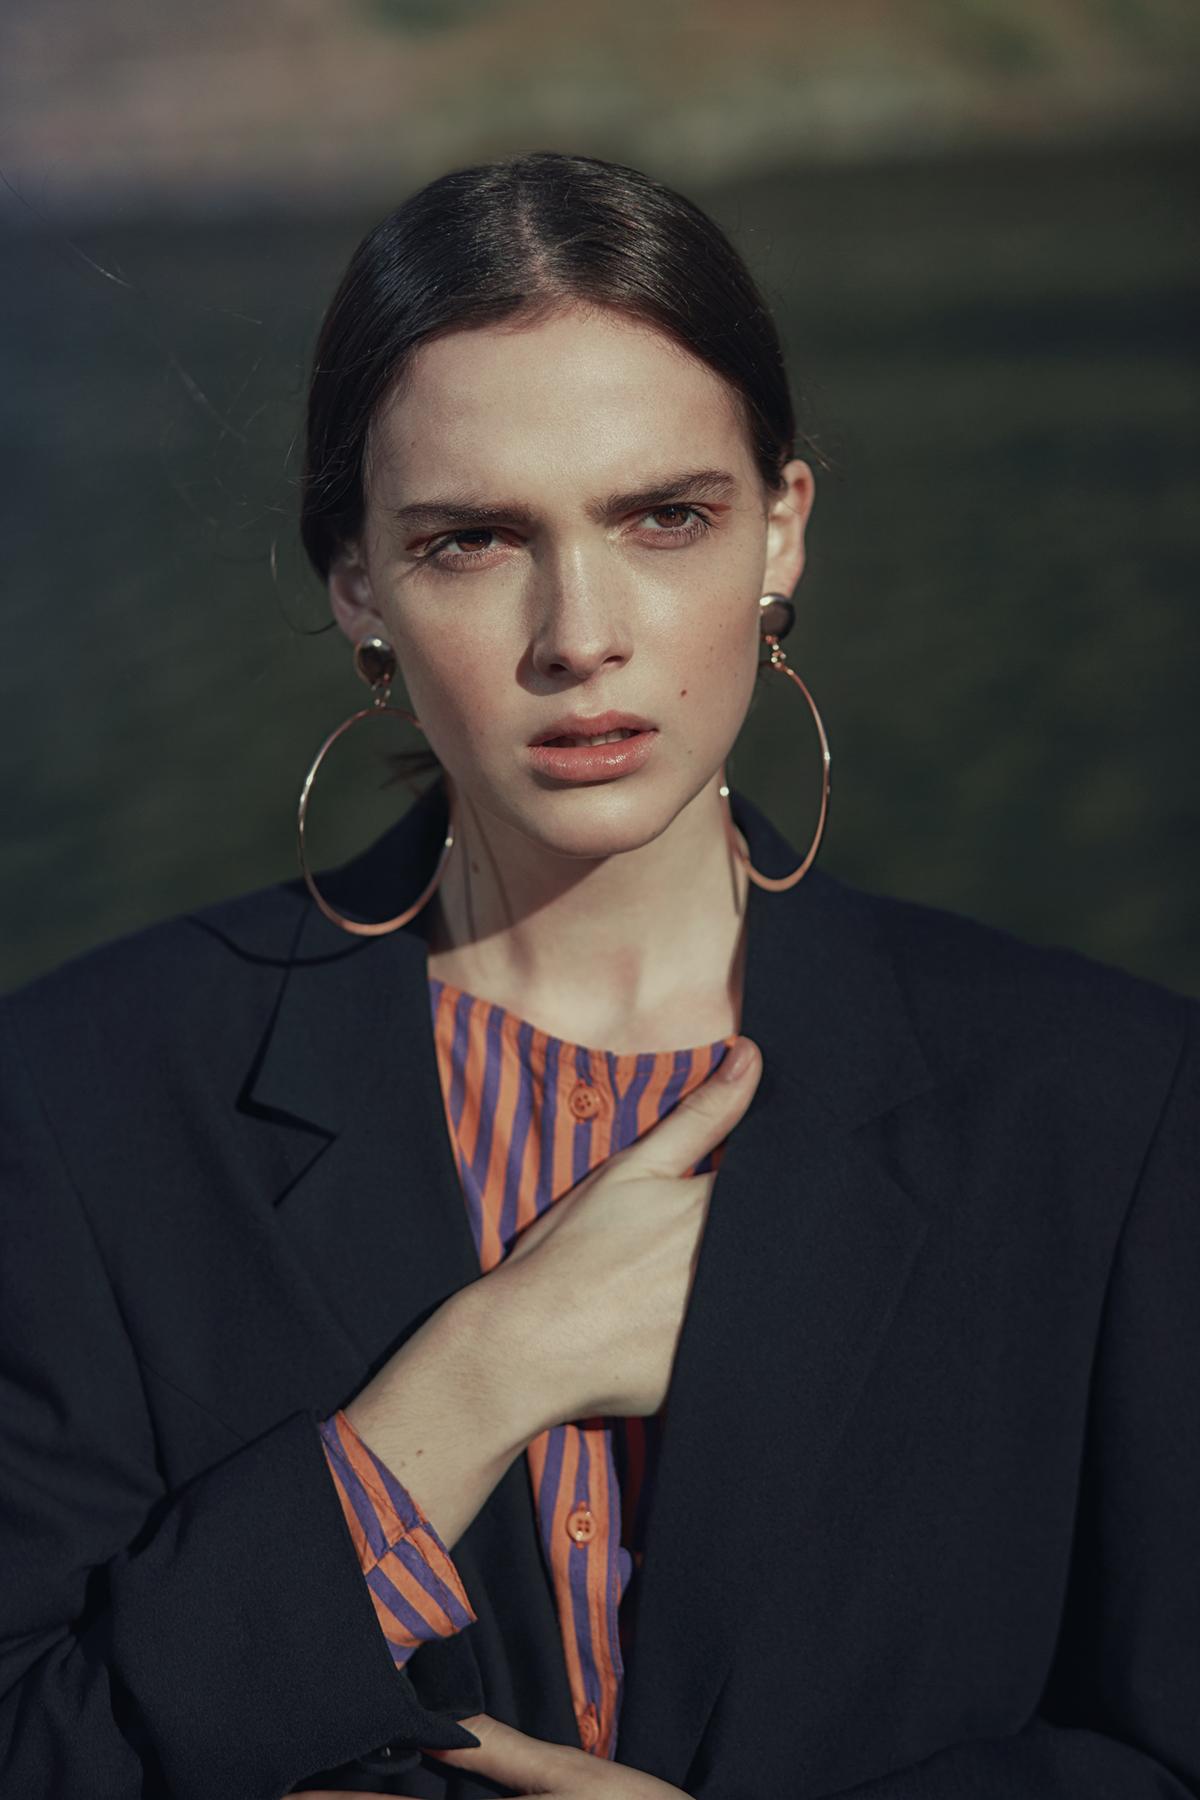 Vintage o  range-and-purple stripe jumpsuit, Roy Curitz;navy blazer, Giorgio;  rose-gold hoop earrings, stylist's own